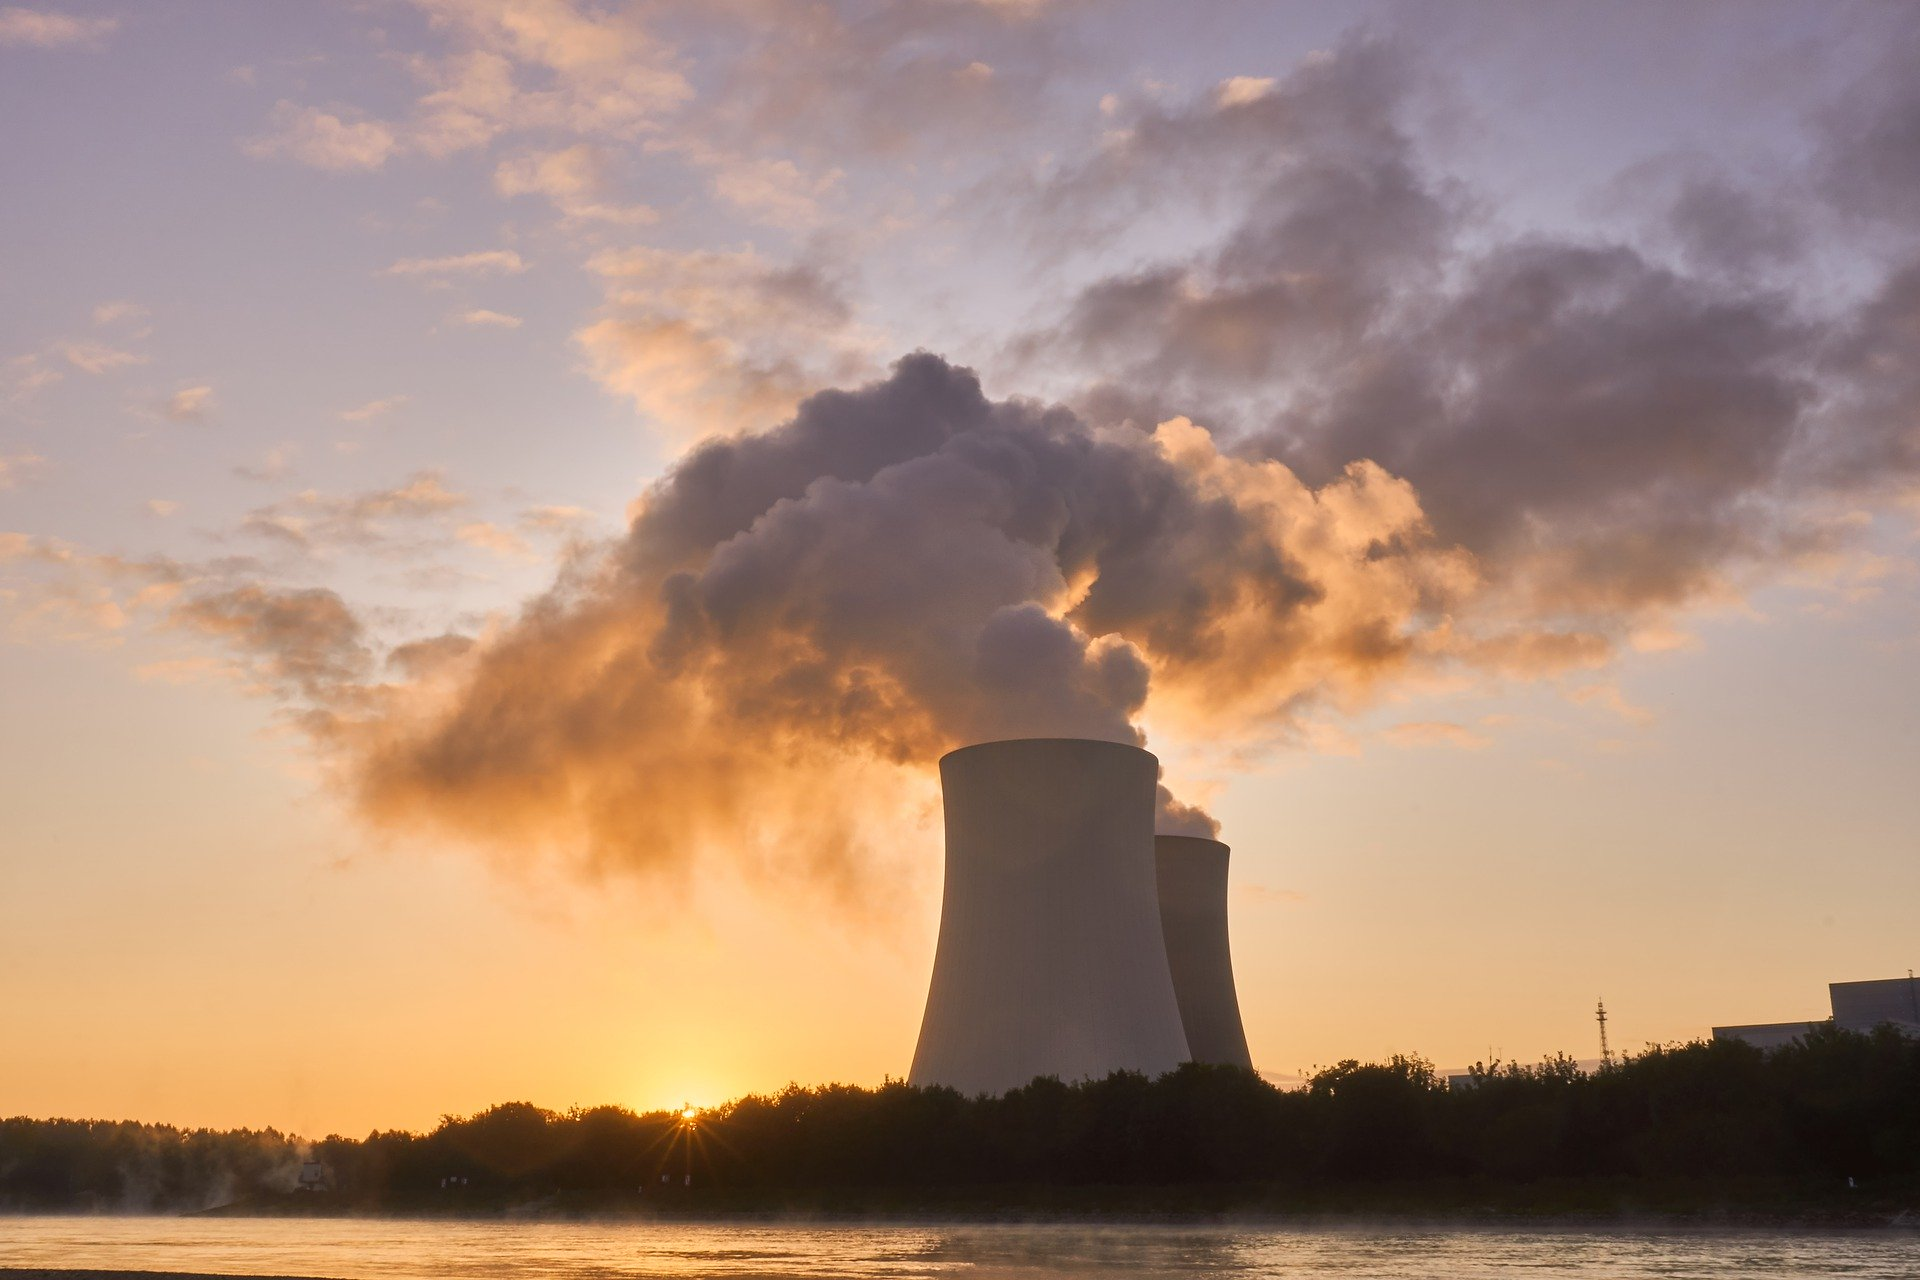 nuclear-power-plant-4535760_1920